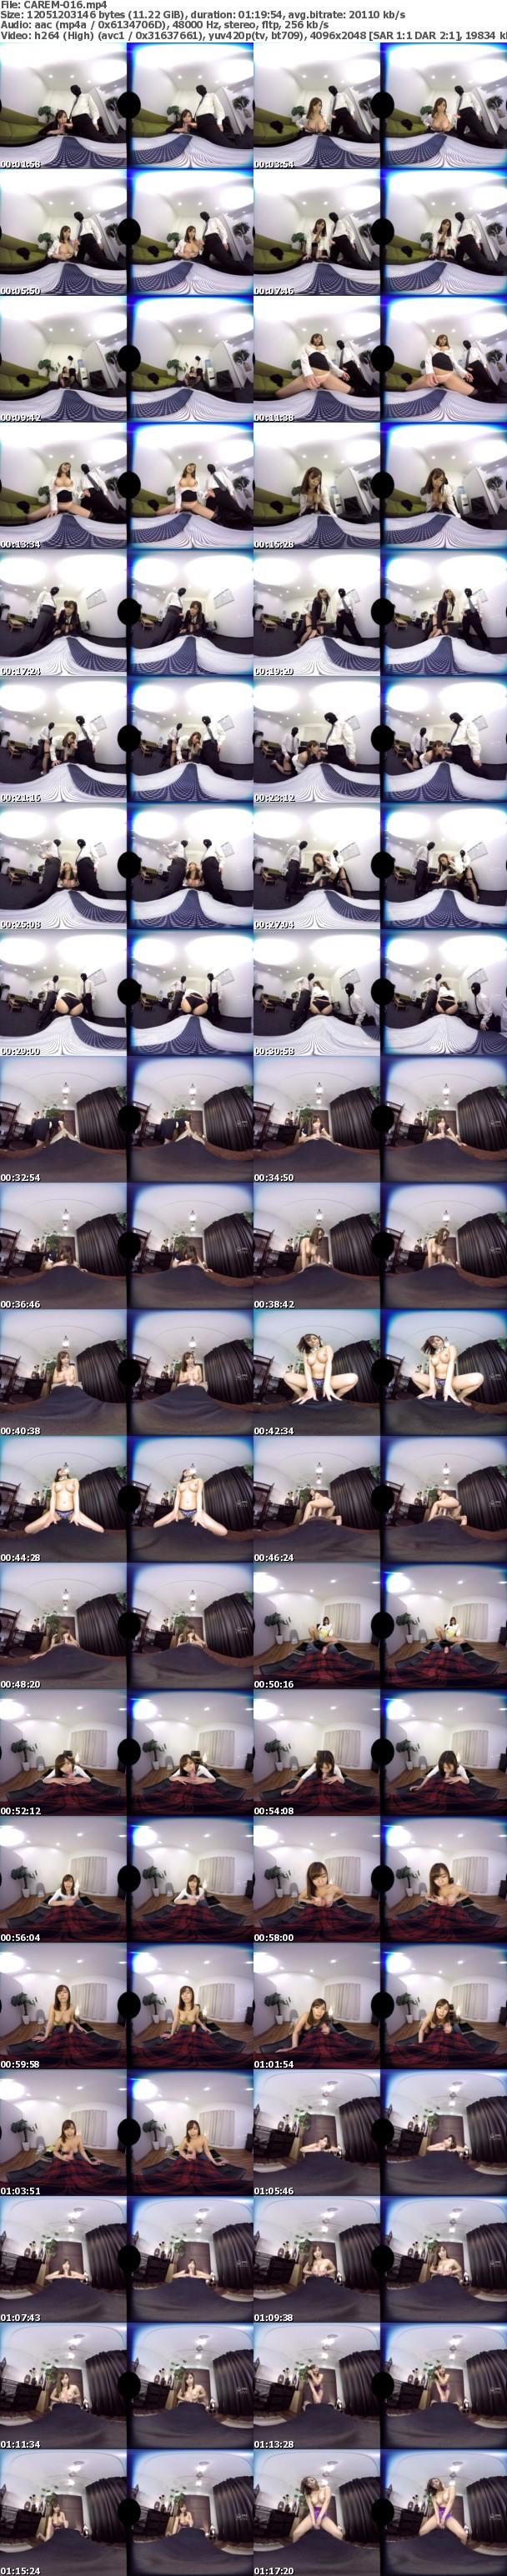 (VR) CAREM-016 デジタルリマスターで鮮明に蘇る!VRドチャシコ名作コレクション~西条沙羅